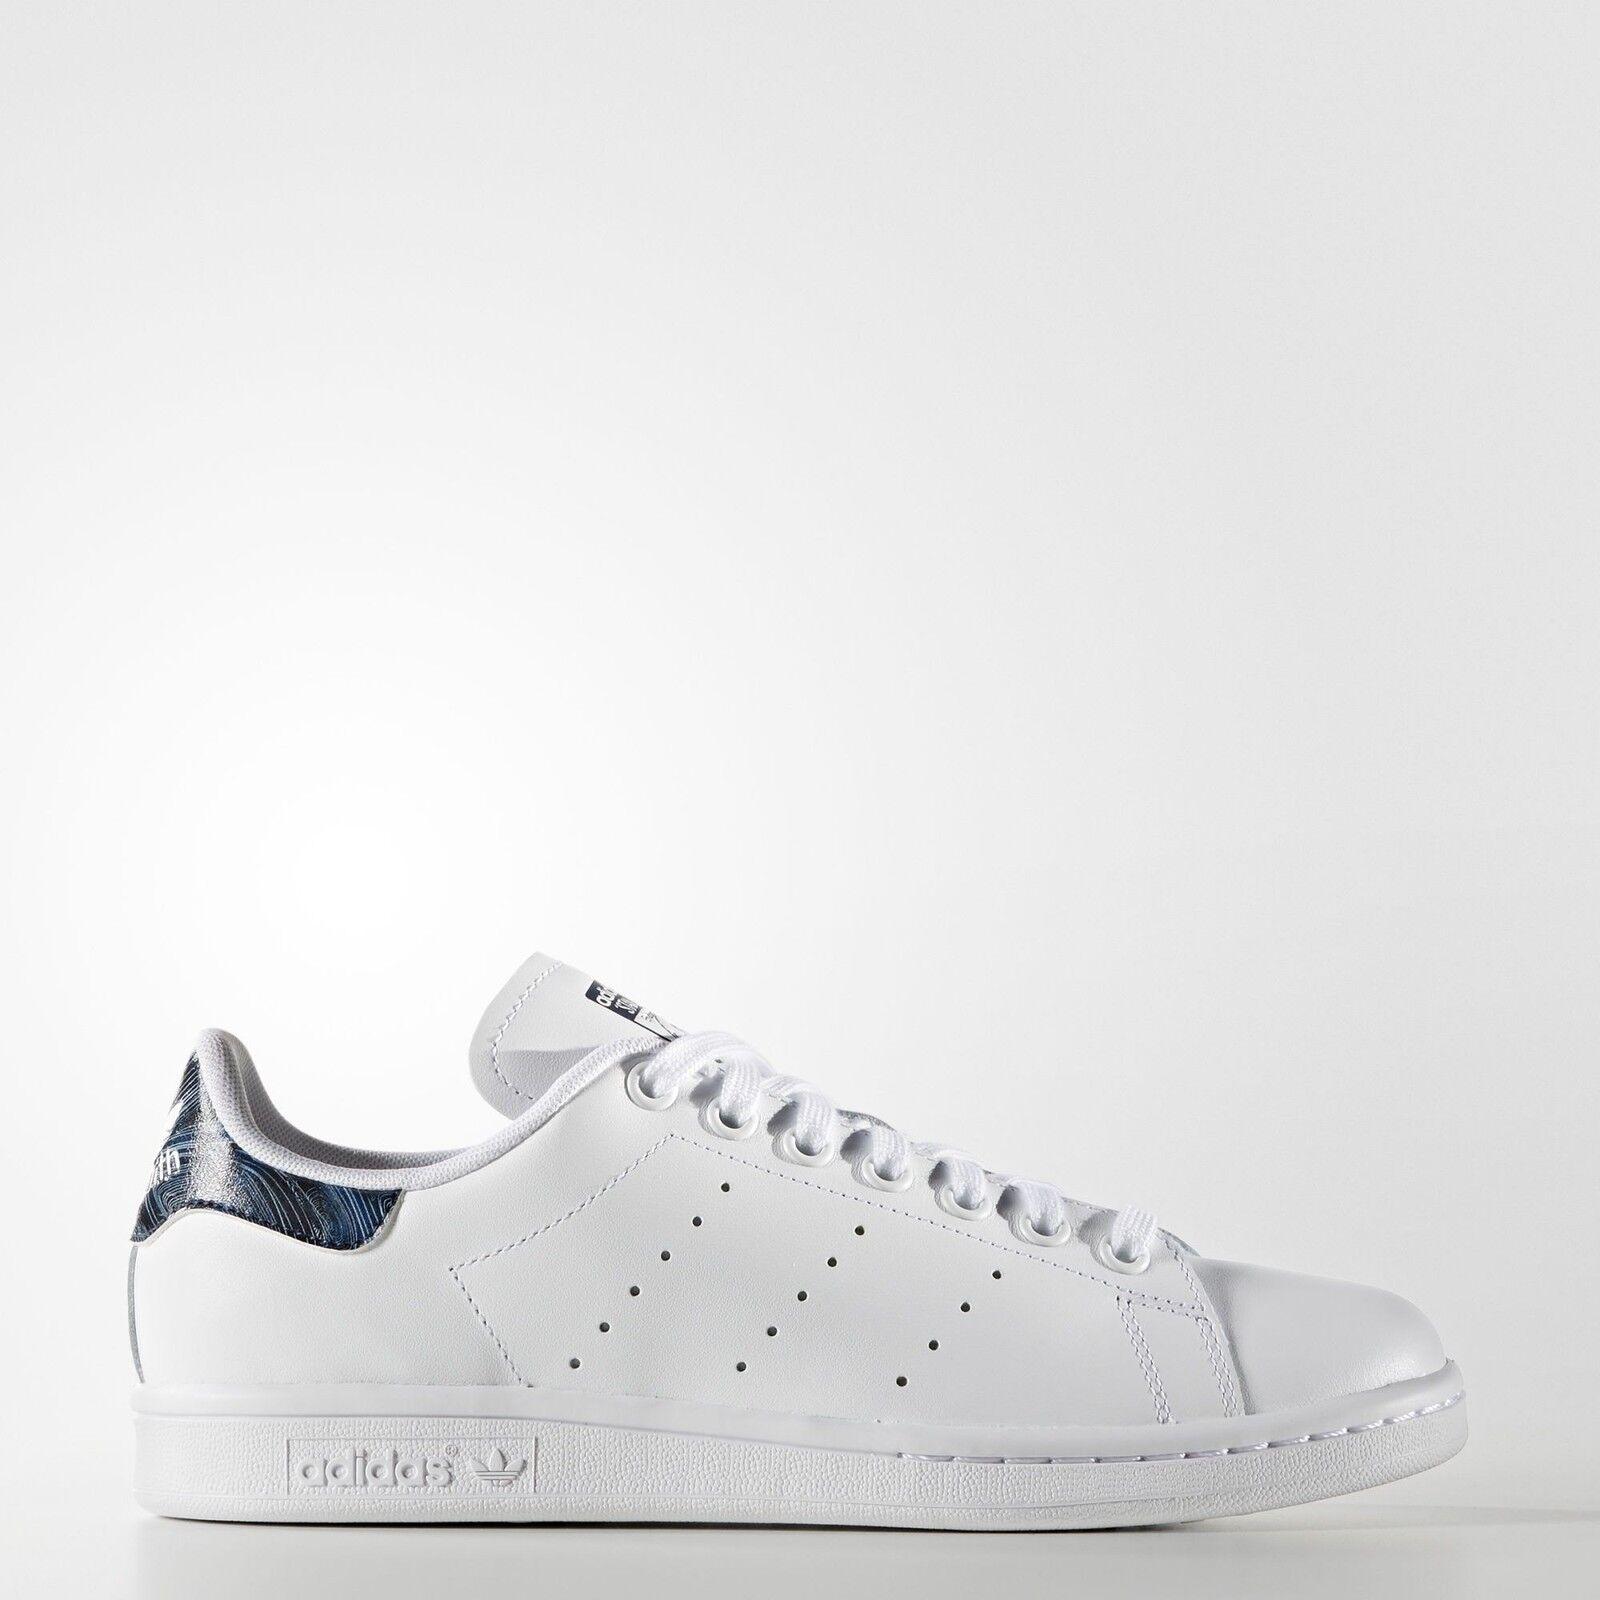 Adidas Damens Stan Smith (WEISS / footwear WEISS / night indigo) BB3009